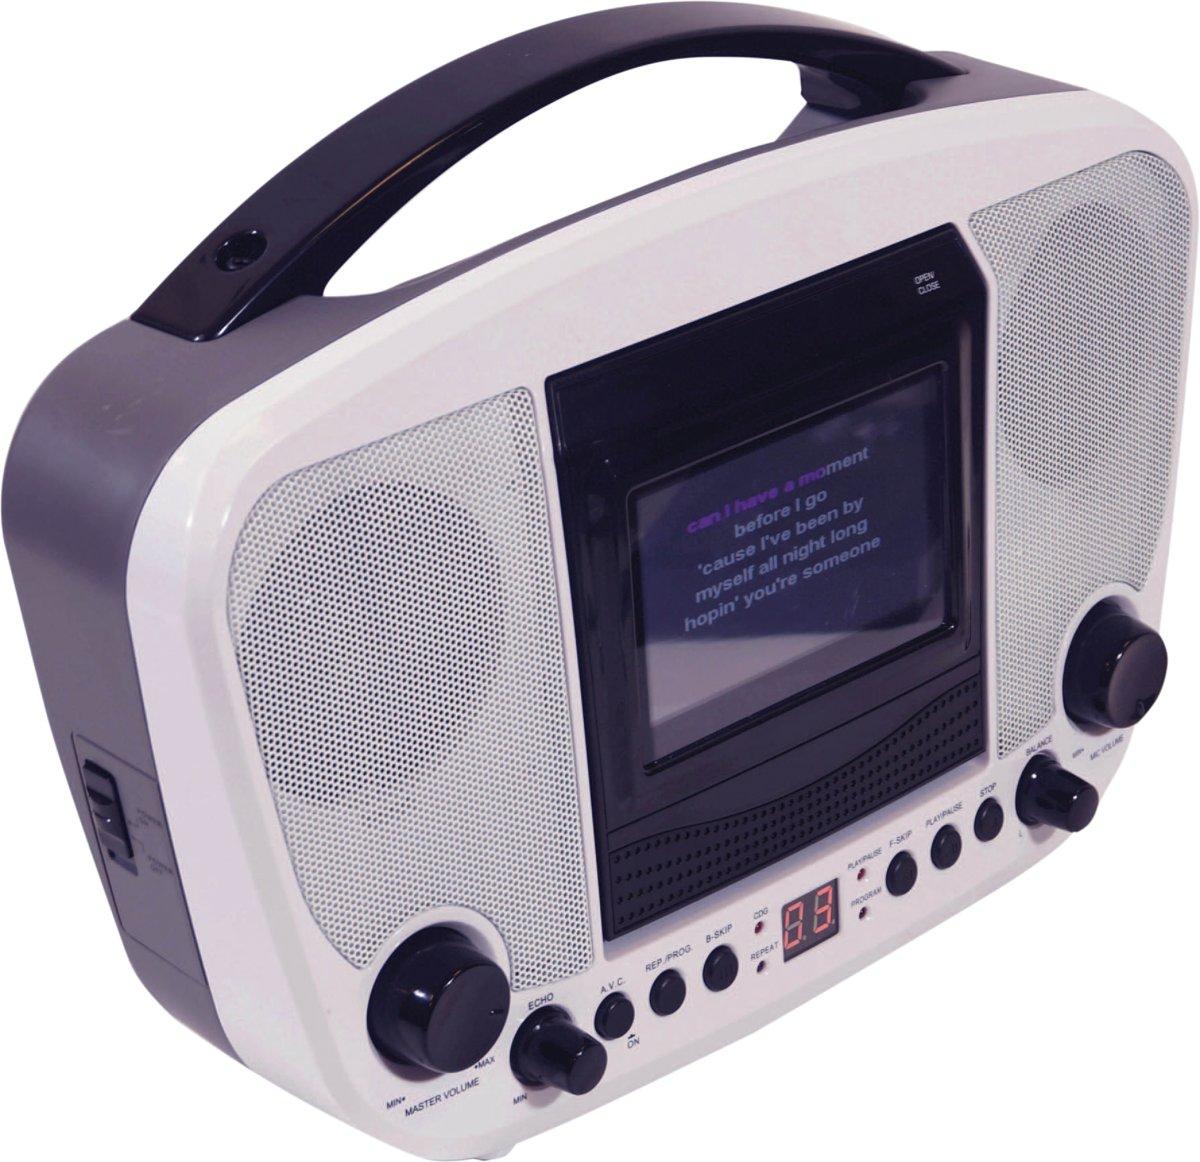 Mr Entertainer KAR122D Bluetooth CDG karaoke machine